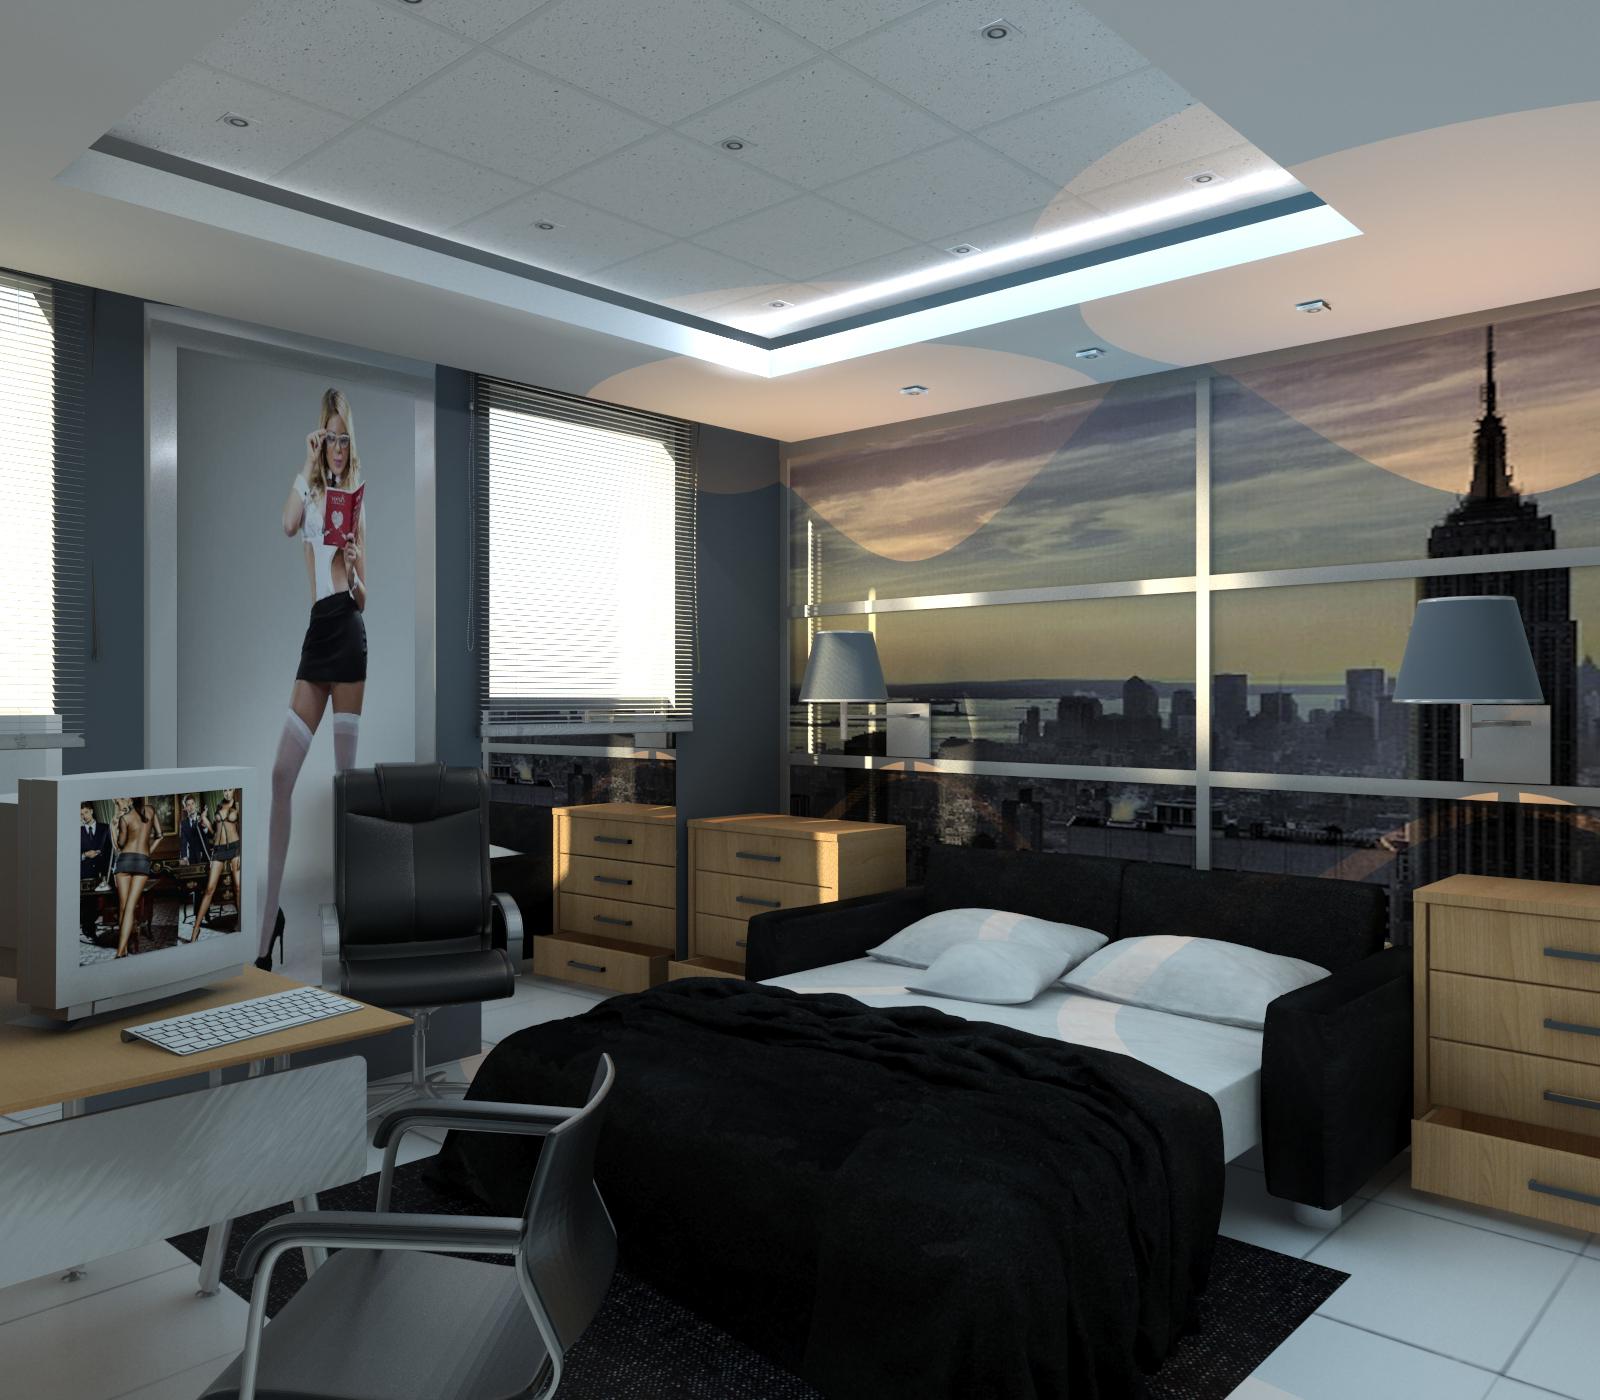 Dise O De Interiores De Hoteles Grupo Mobilart